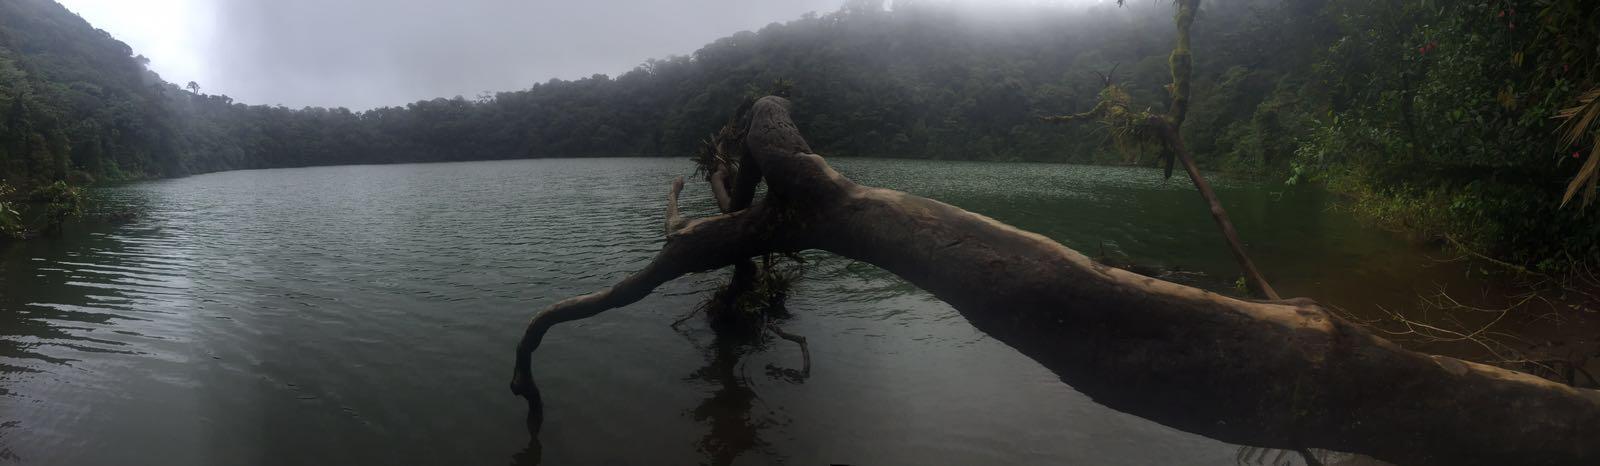 Lagune Cerro Chato